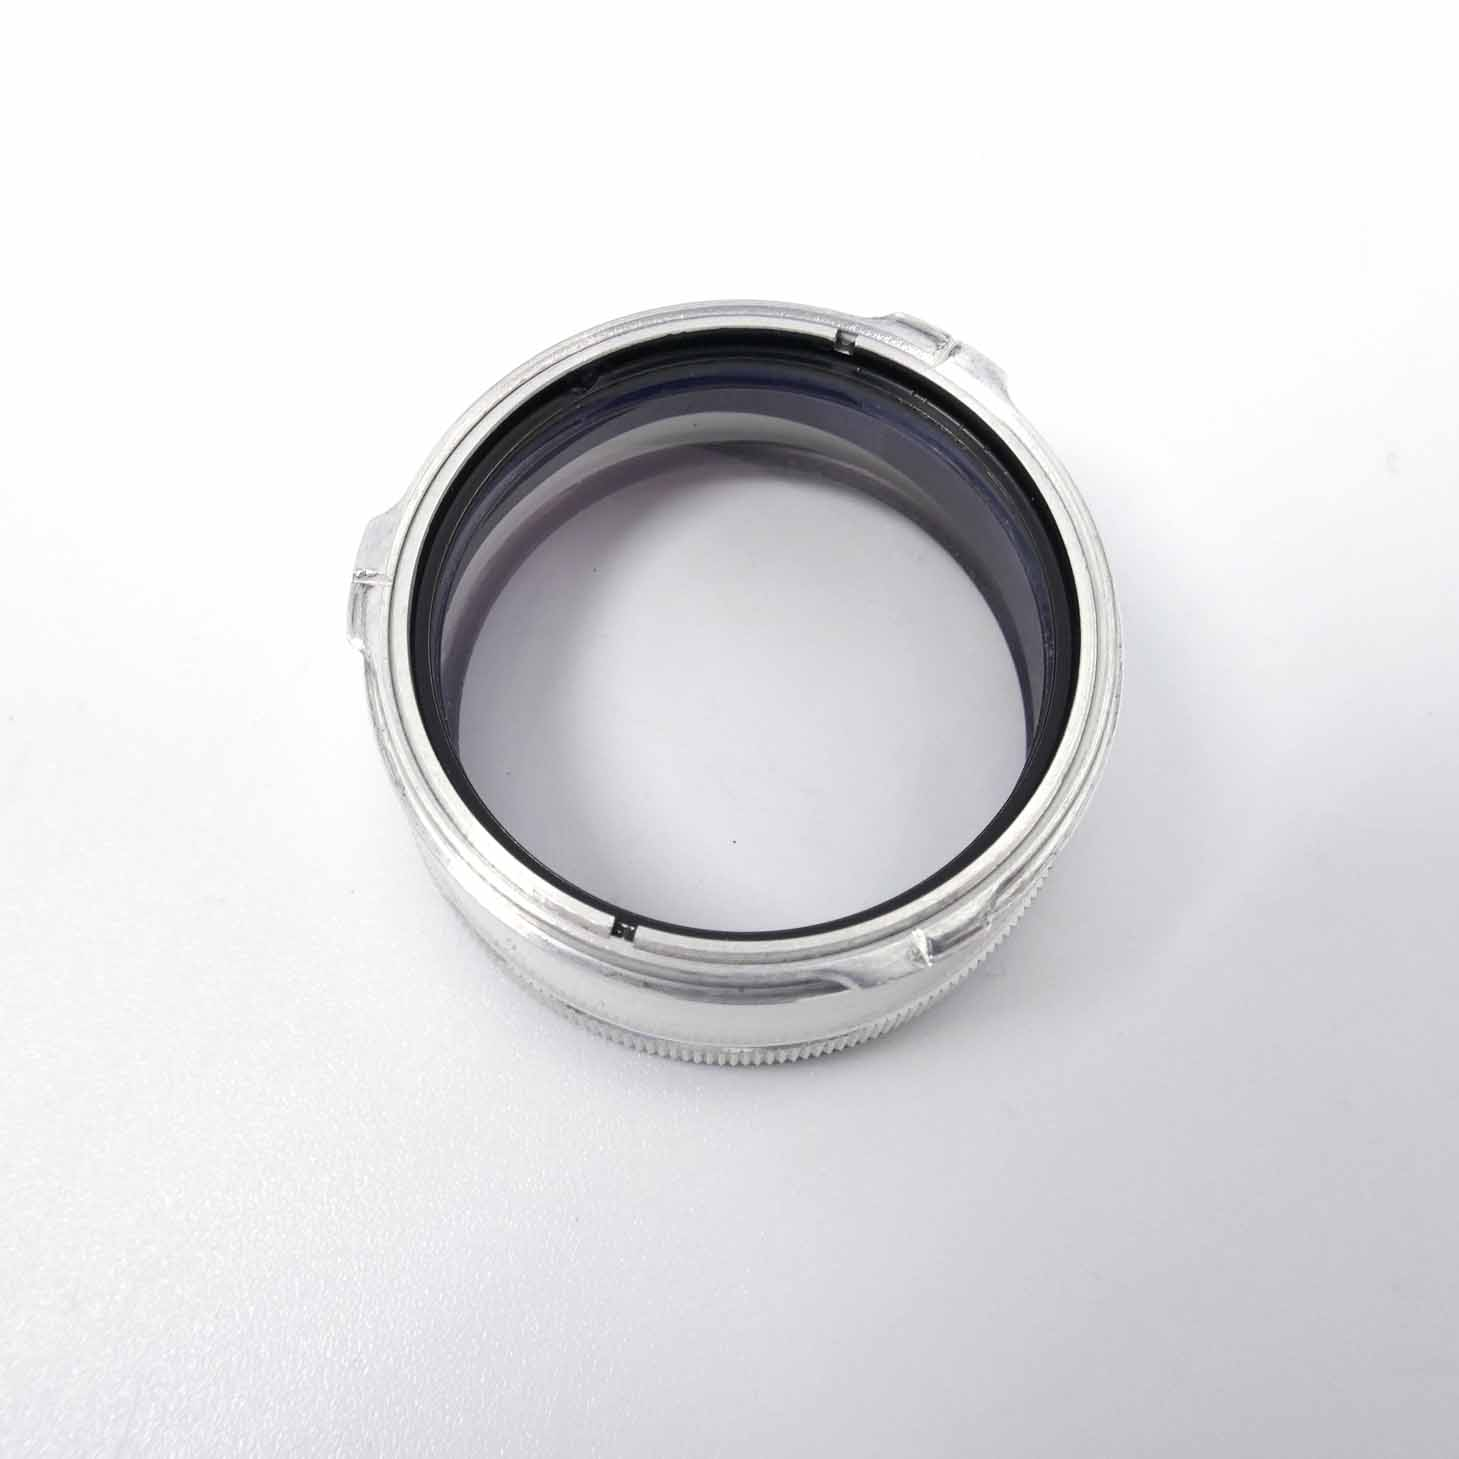 clean-cameras-Rolleinar-3-Bajonett-I-03